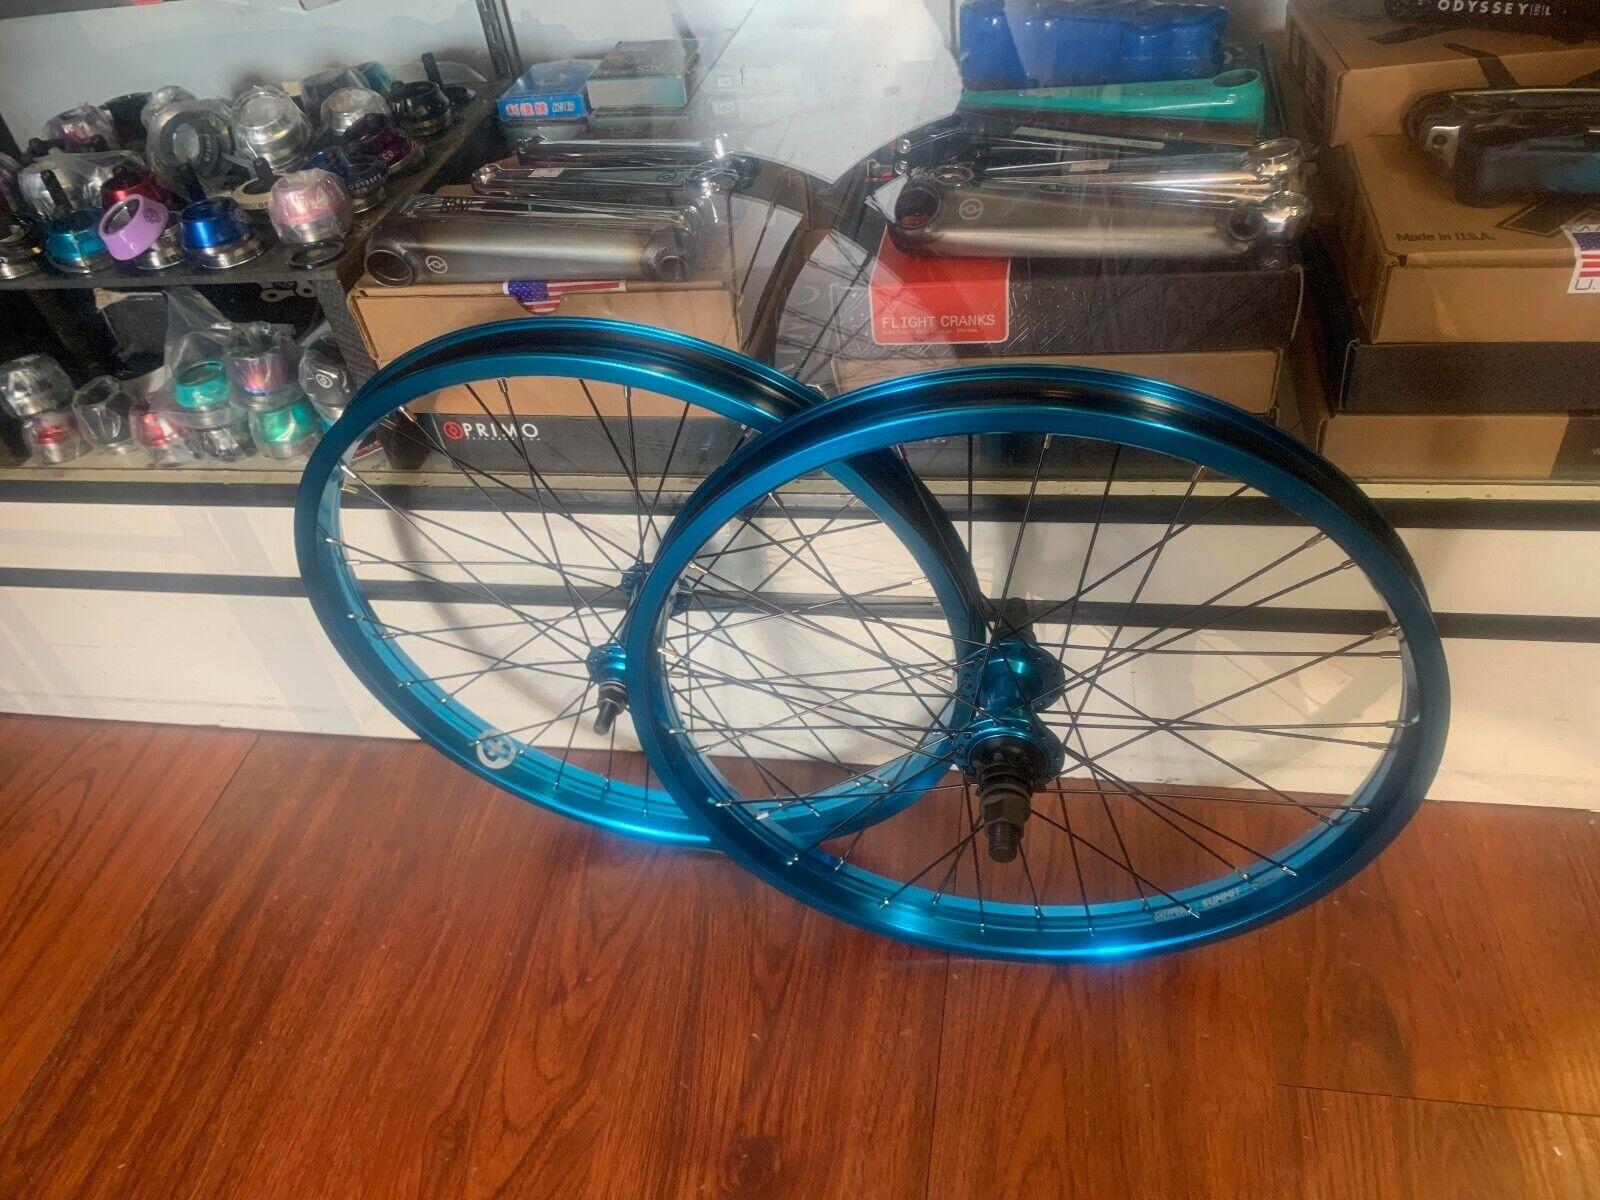 SALT PLUS EVEREST 9 CASSETTE  COMPLETE WHEEL SET blueE 20  WHEELS BMX BIKE SUMMIT  exclusive